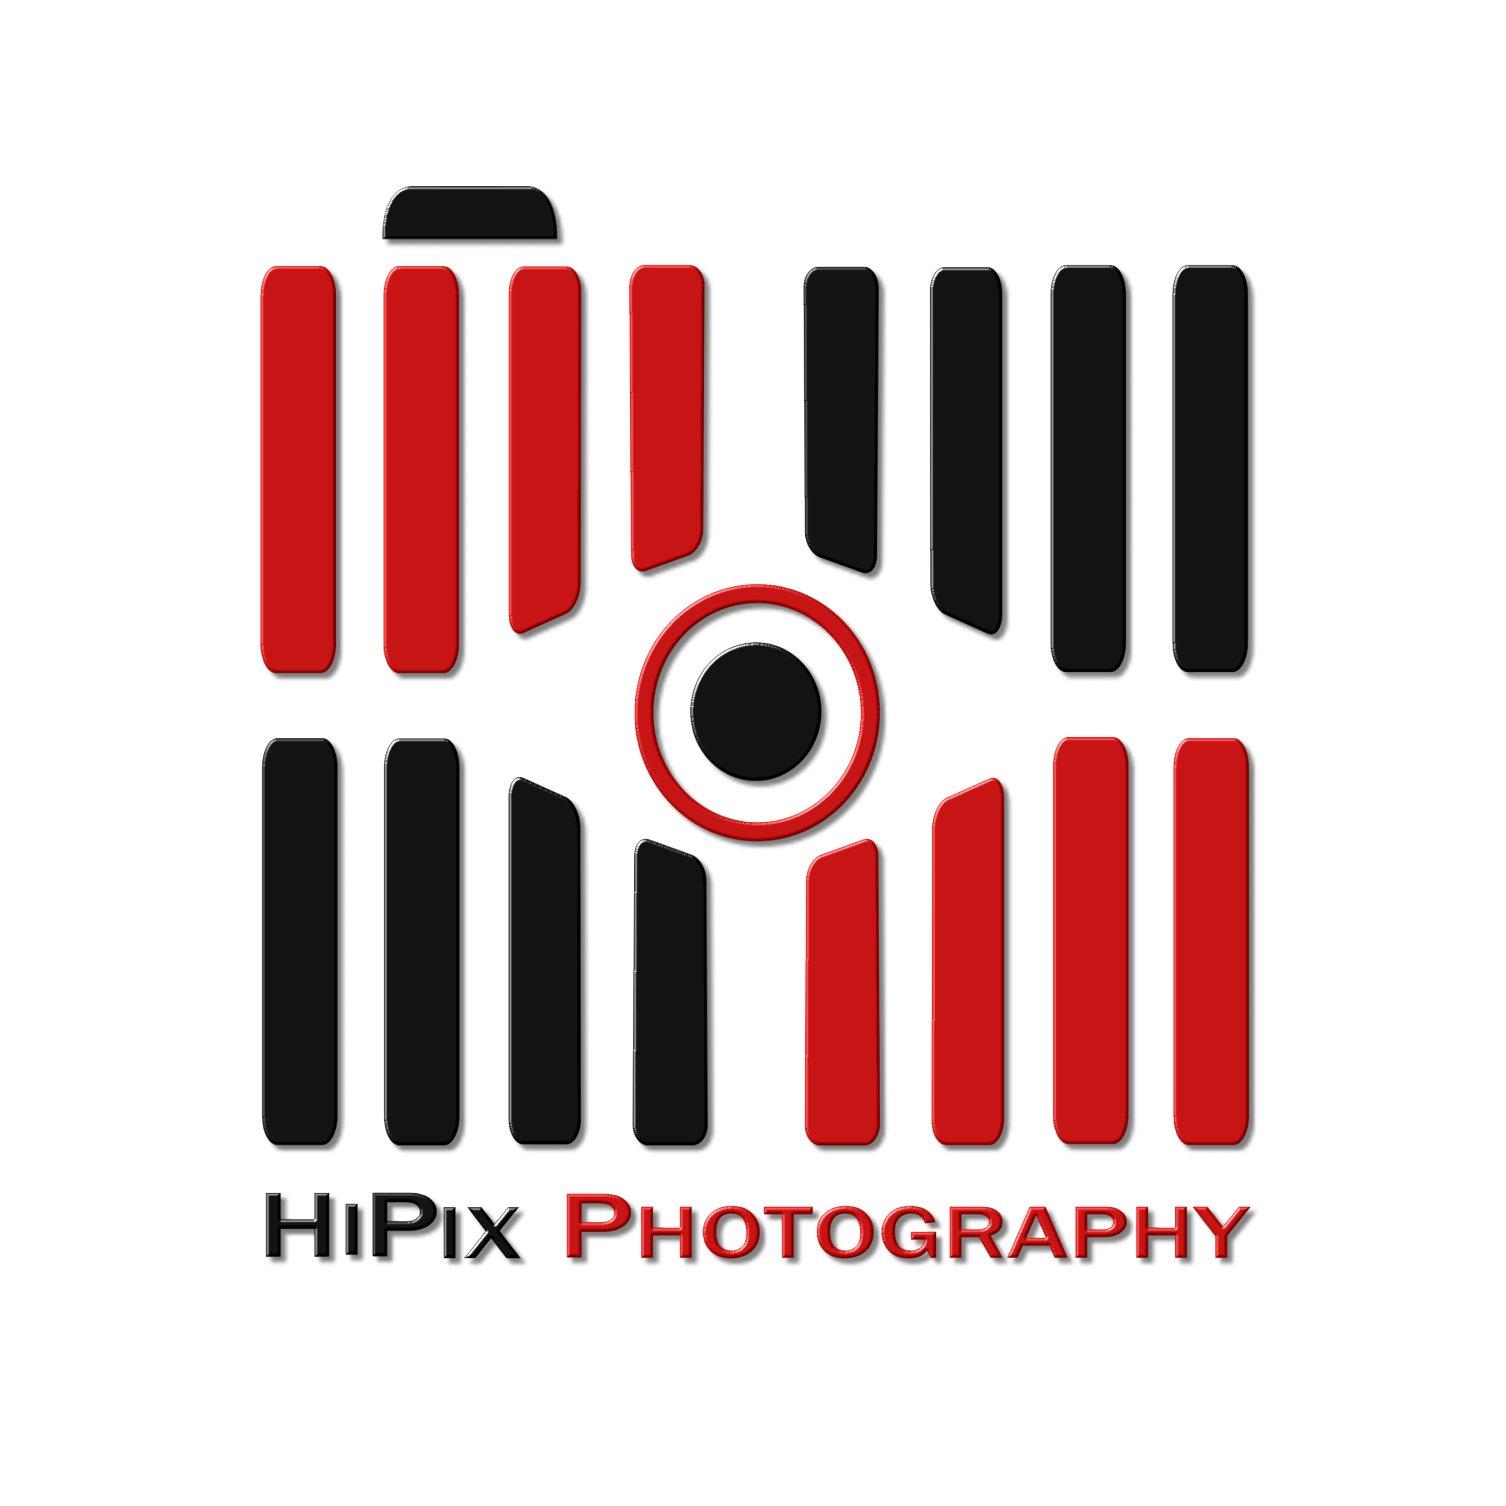 HiPix